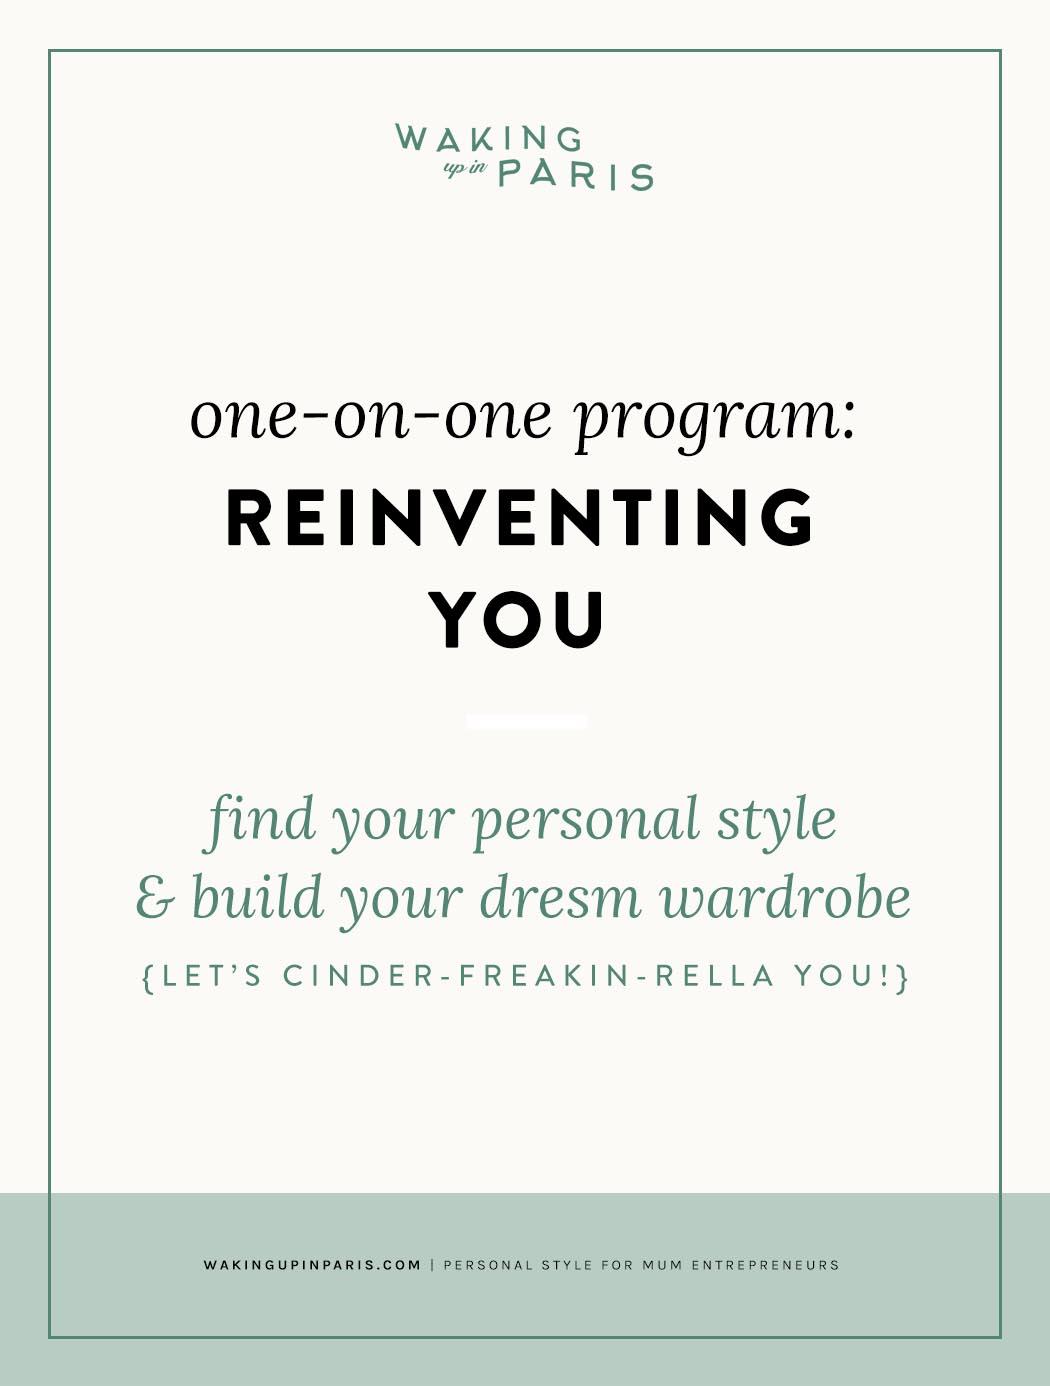 WUIP-clarissa-grace-personal-style-coach-online-mum-entrepreneur-business-reinventing-you-10.jpg